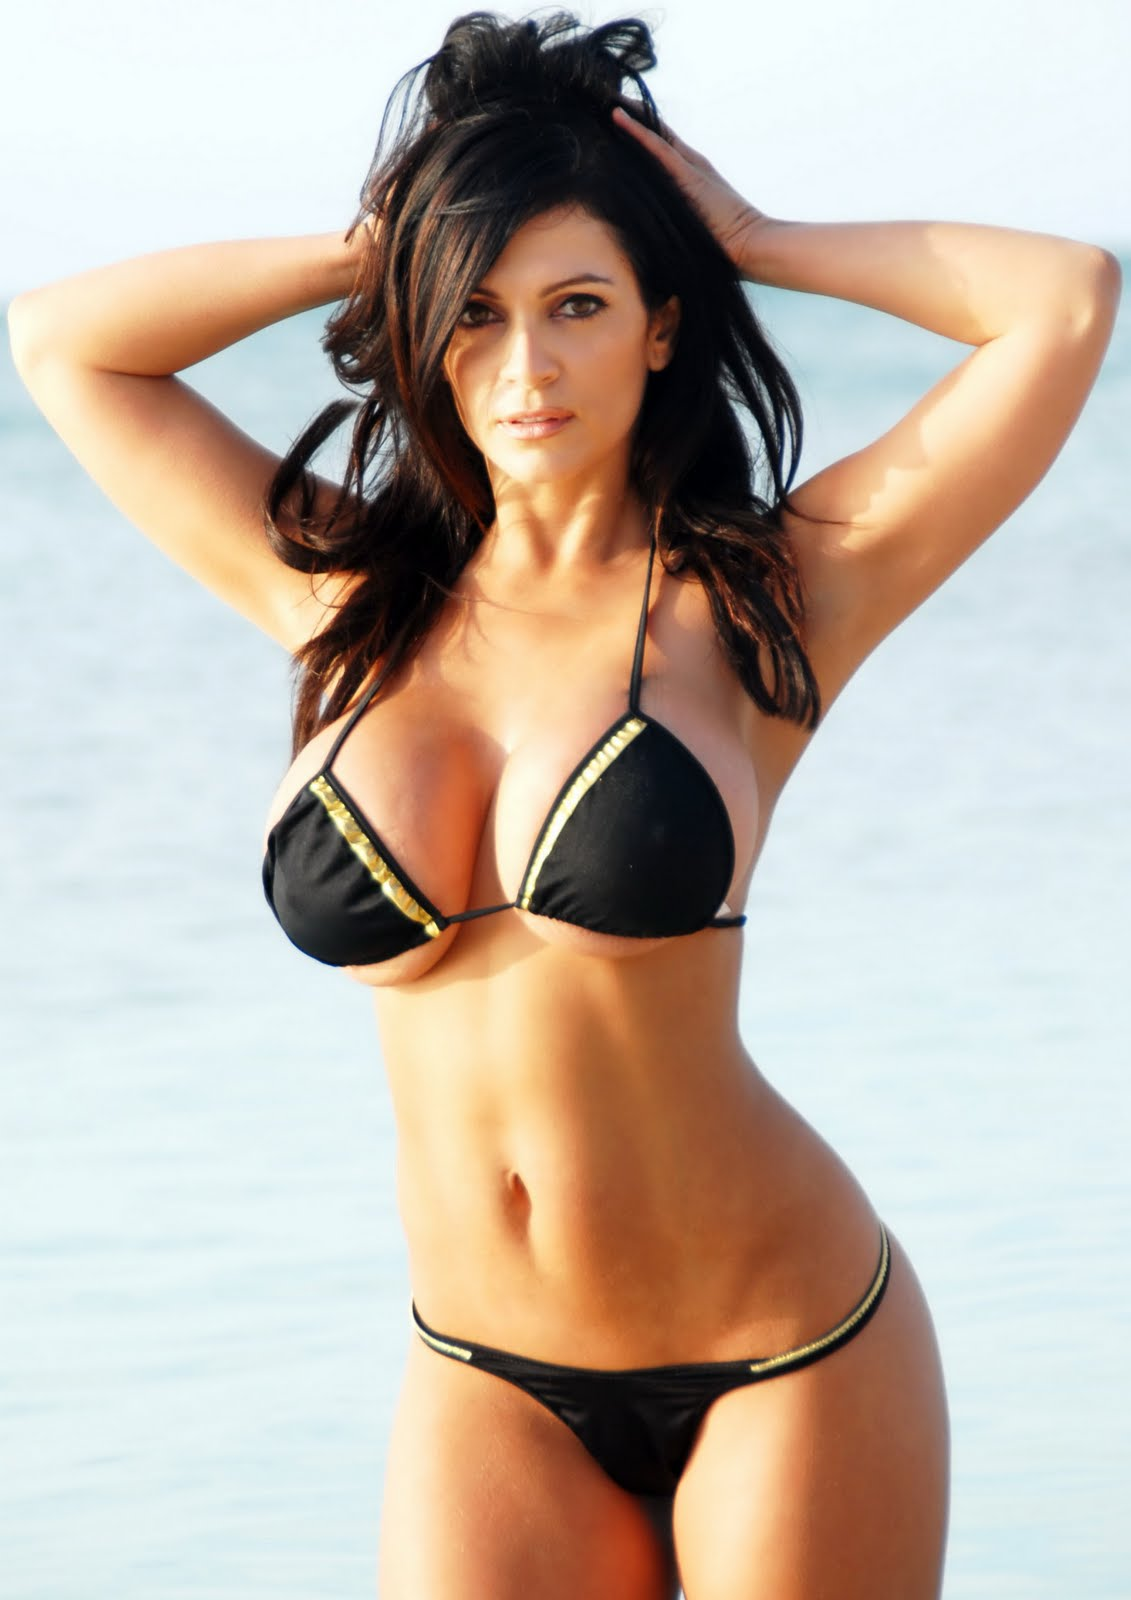 BabeStrip: Denise Milani super post!